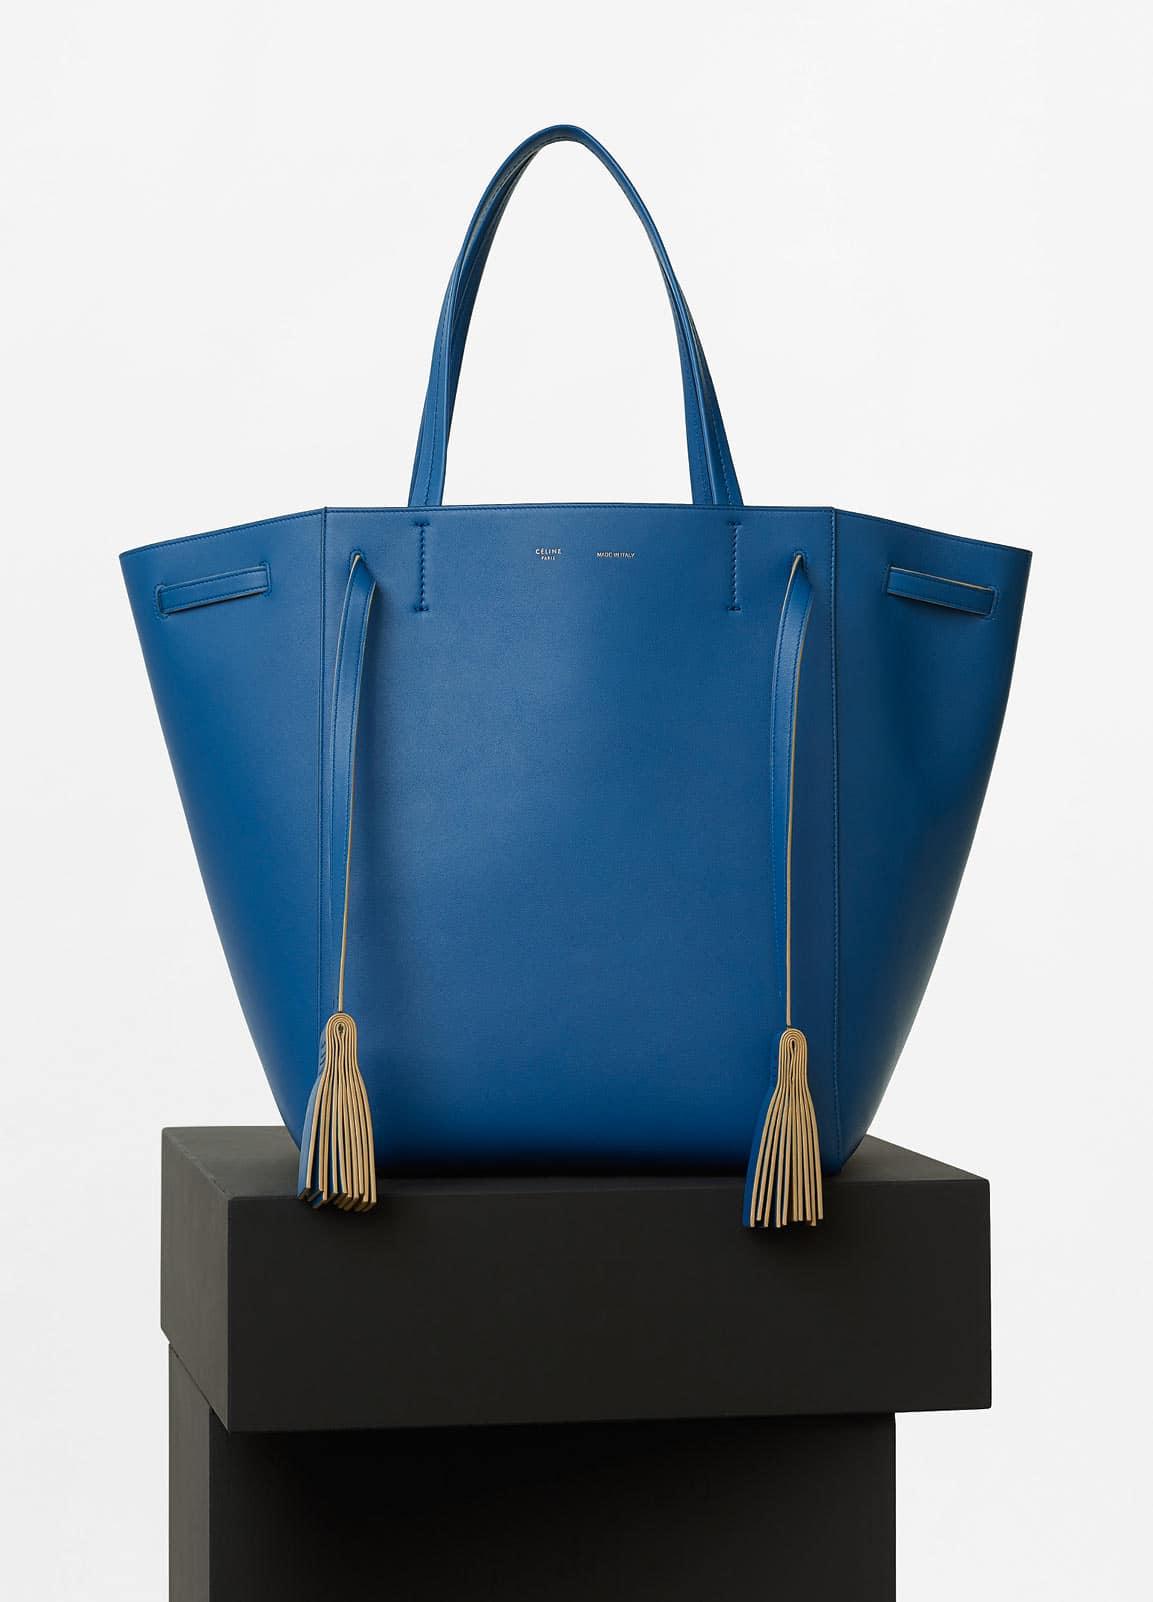 royal blue suede handbag - Celine Resort 2016 Bag Collection Featuring New Saddle Bags ...